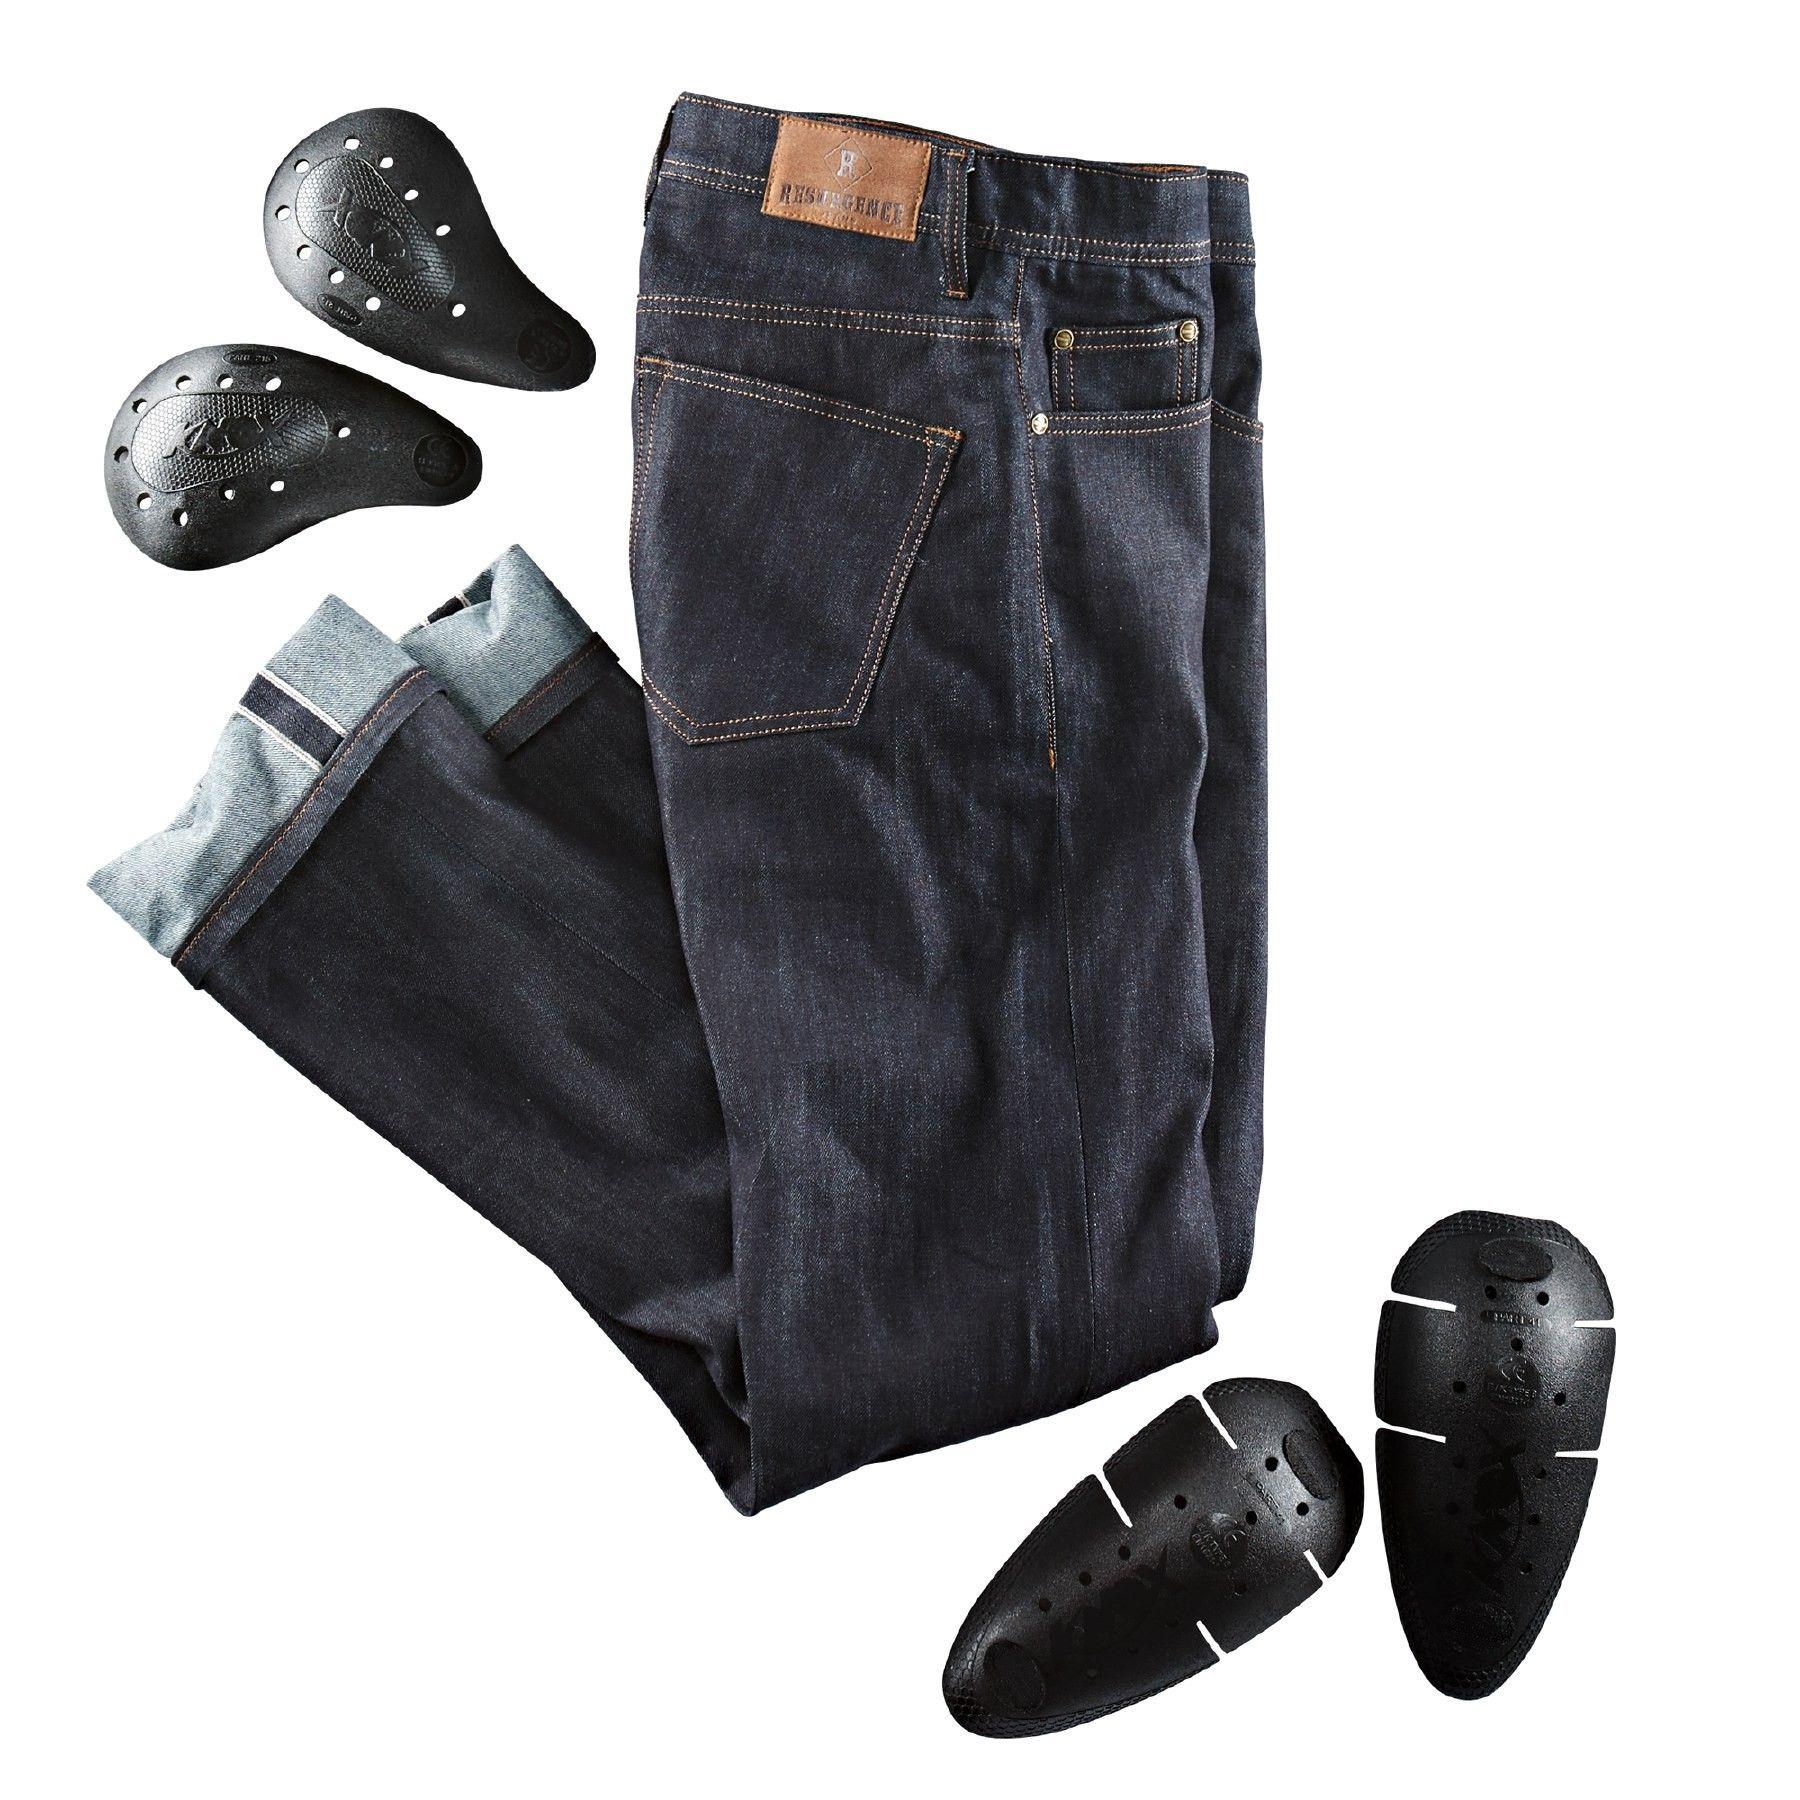 resurgence raw denim cafe racer jeans | resurgence gear